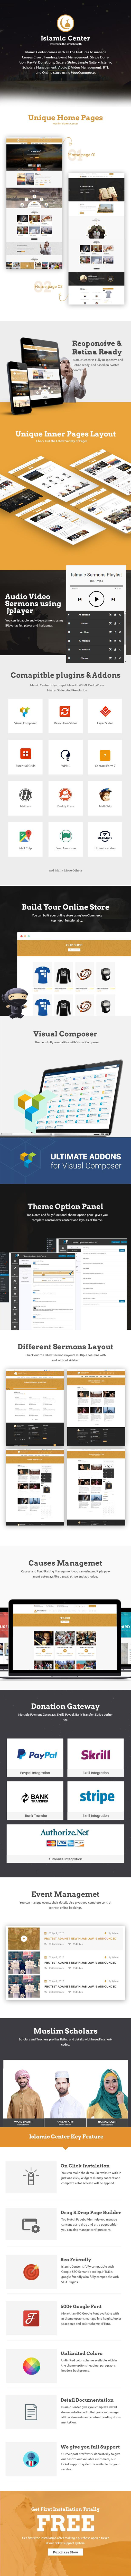 Islamic Theme WordPress Features Information